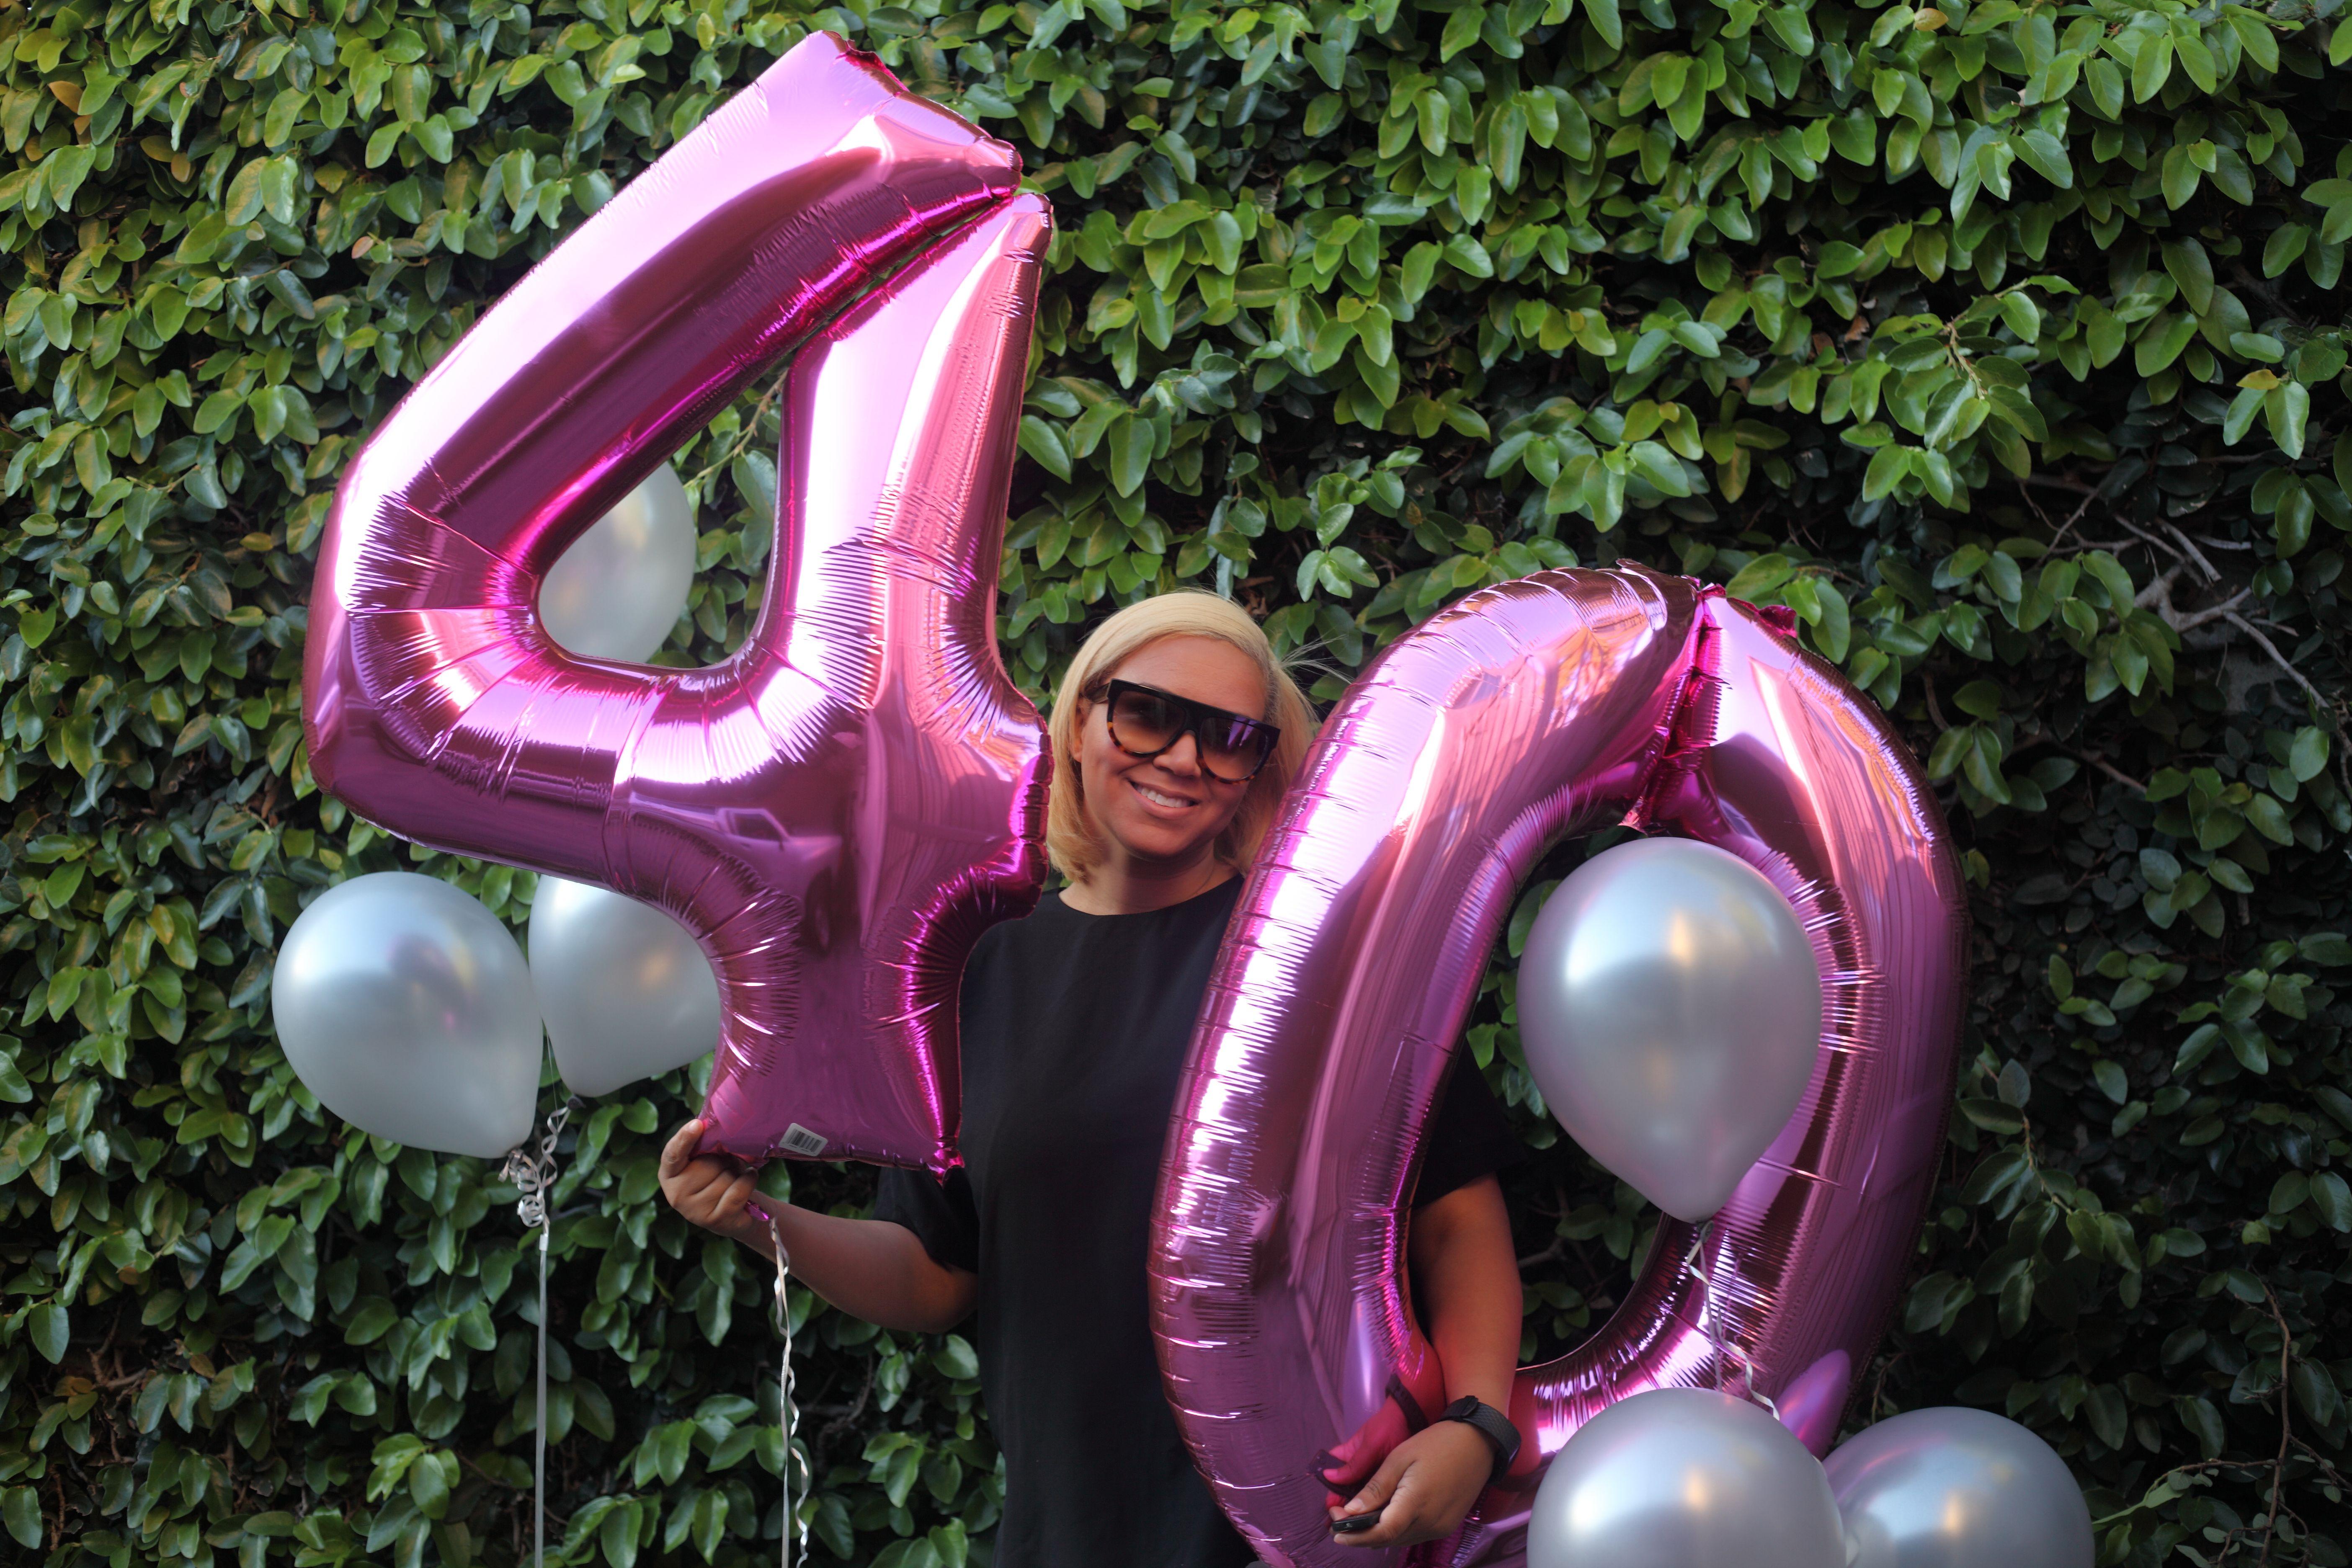 Birthday Photoshoot Photo Shoot 40th Birthday 40th Birthday Ideas Birthday Photoshoot 40th Birthday Birthday Photos [ 3744 x 5616 Pixel ]